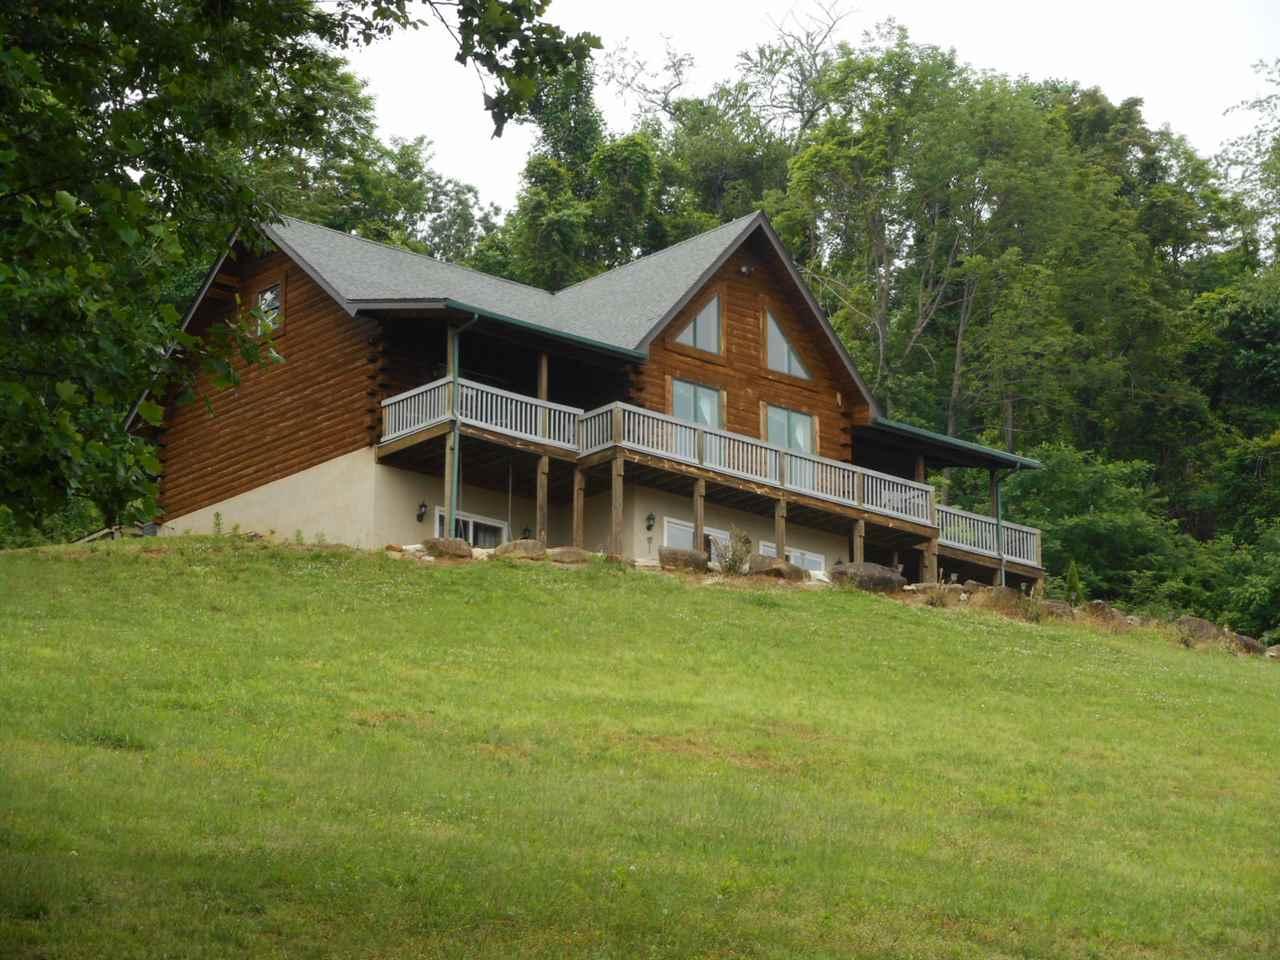 21577 FOREST HOMES DR, ELKTON, VA 22827